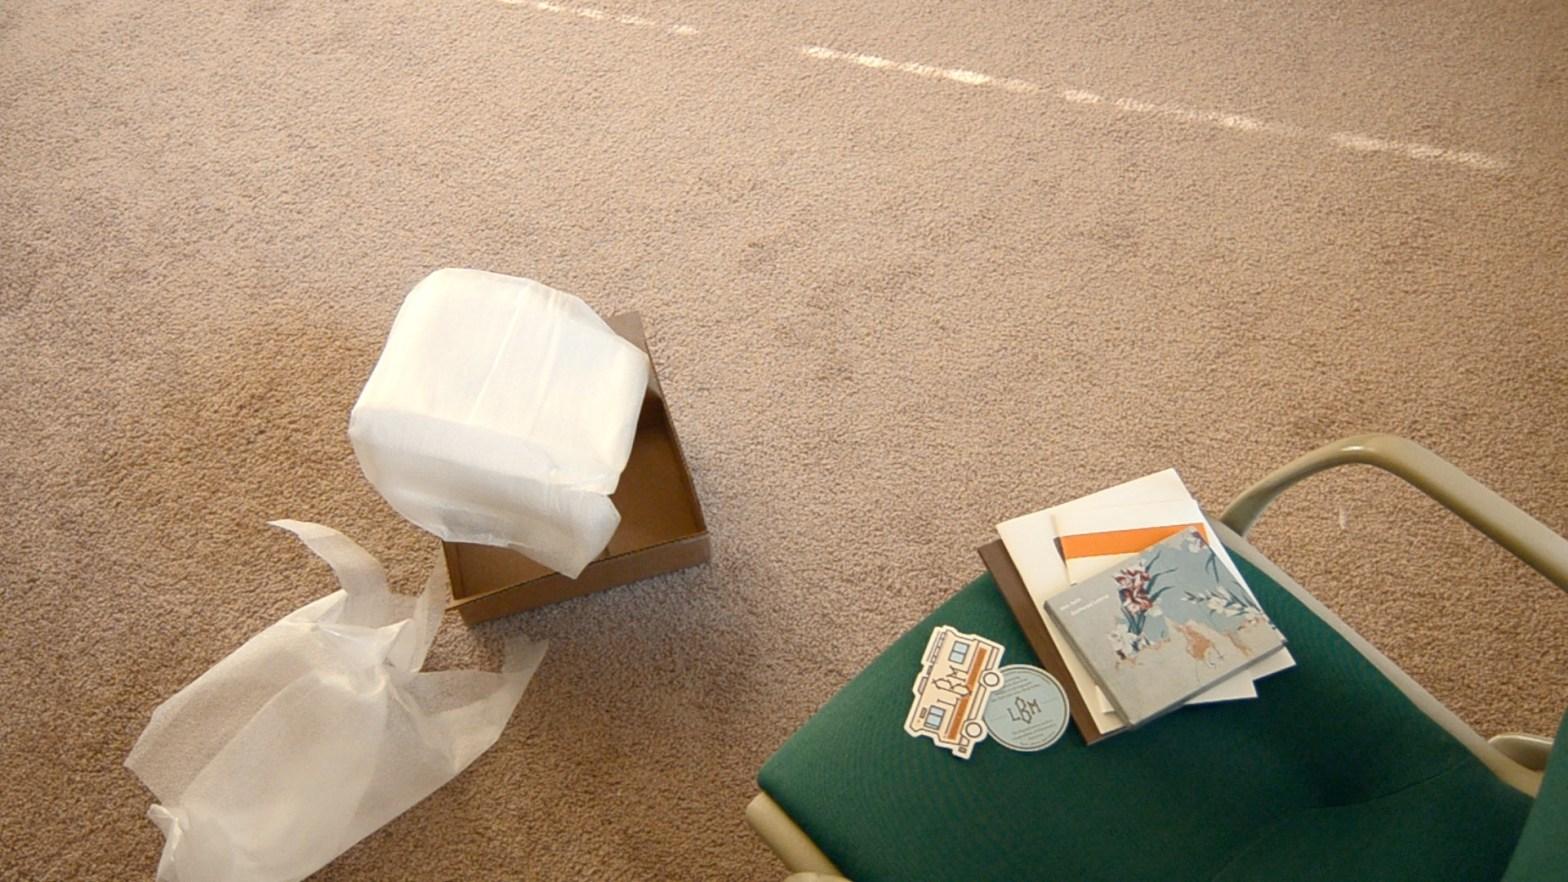 Unboxing-an-LBM-Grab-Bag